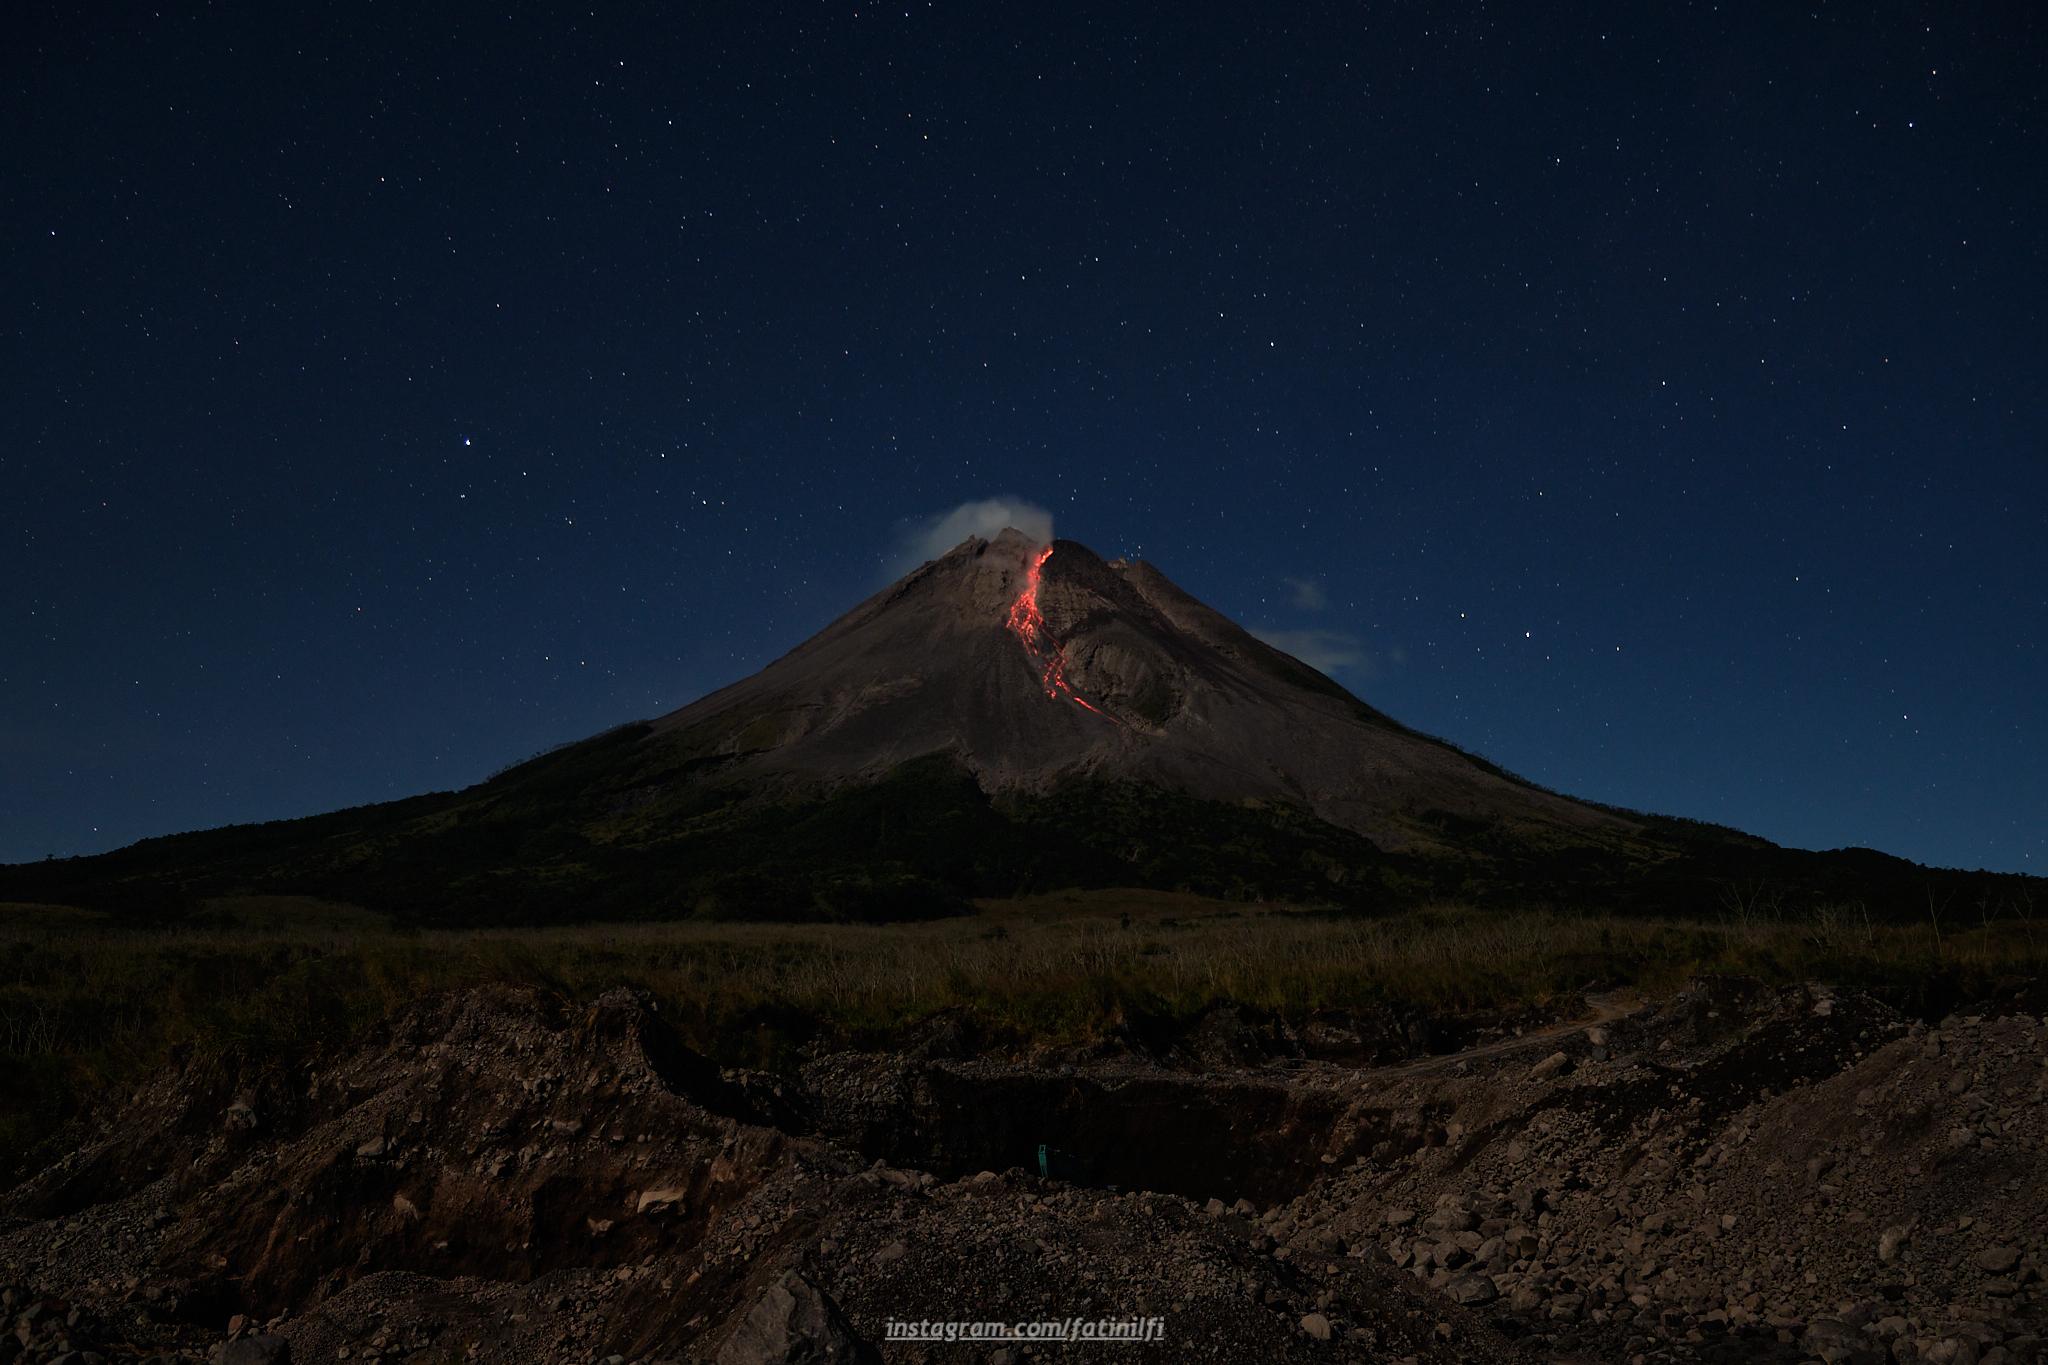 July 17, 2021. EN. Philippines : Taal , Indonesia : Merapi , Chile : Nevados de Chillan , Martinique : Montagne Pelée , Iceland : Geldingadalur / Fagradalsfjall .